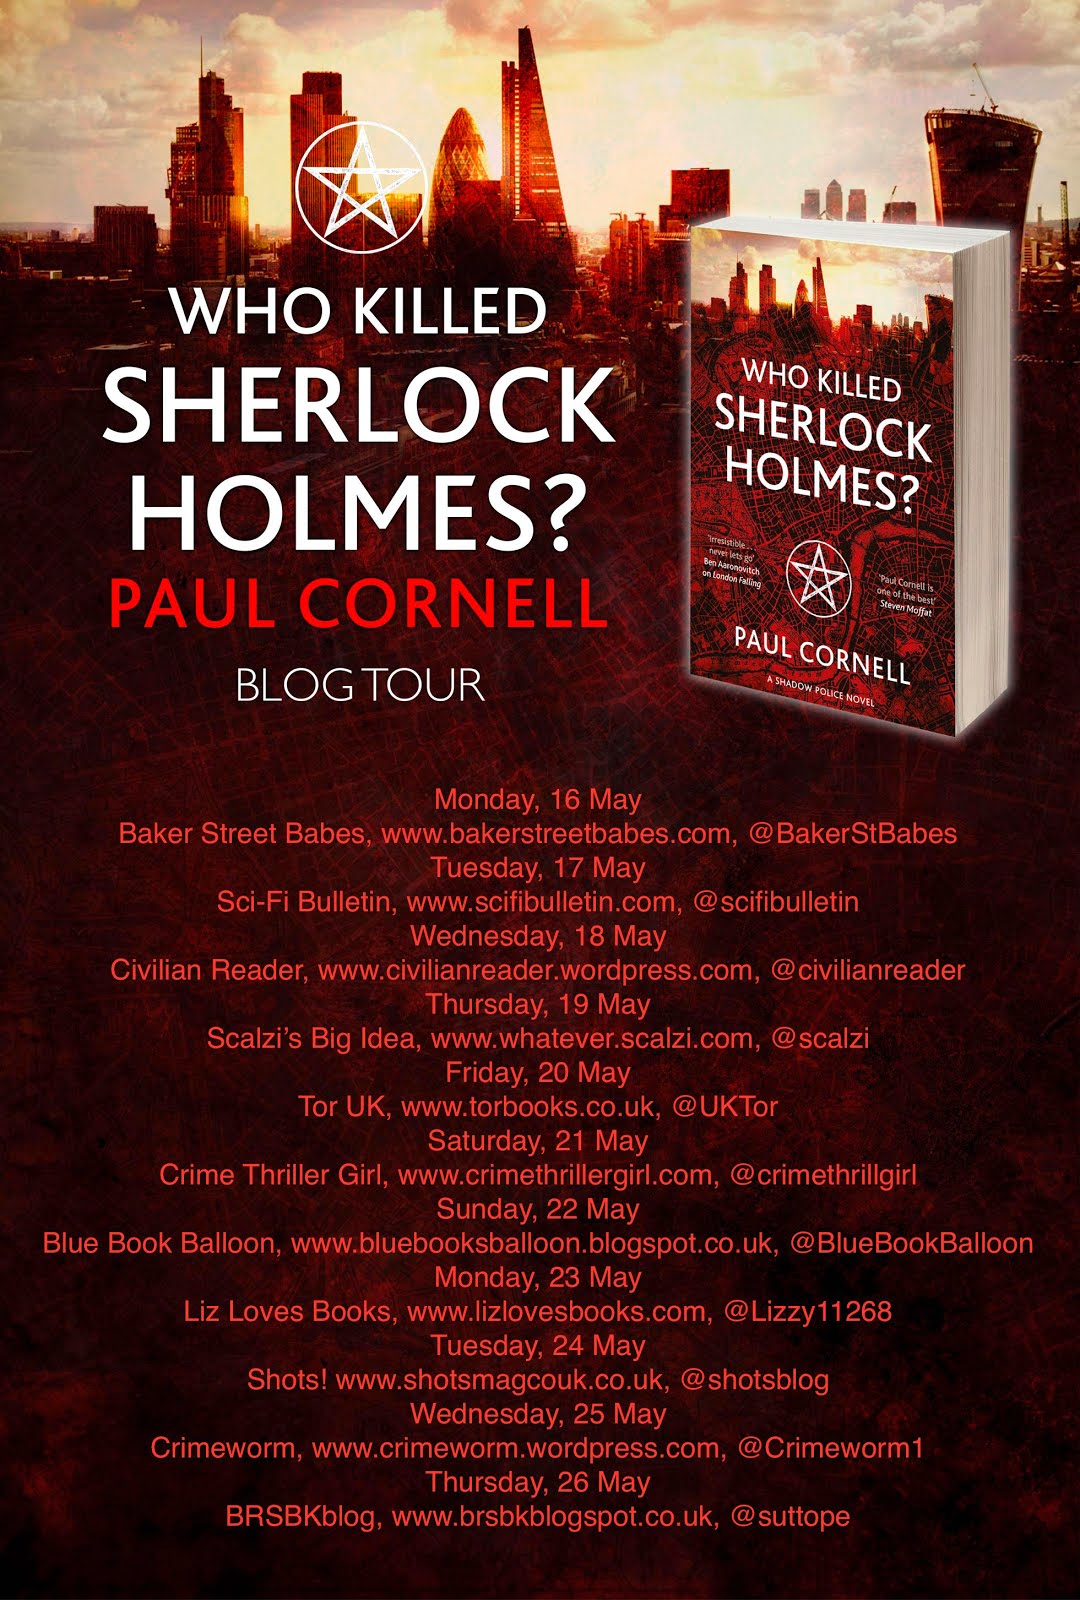 Who Killed Sherlock Holmes? blogtour